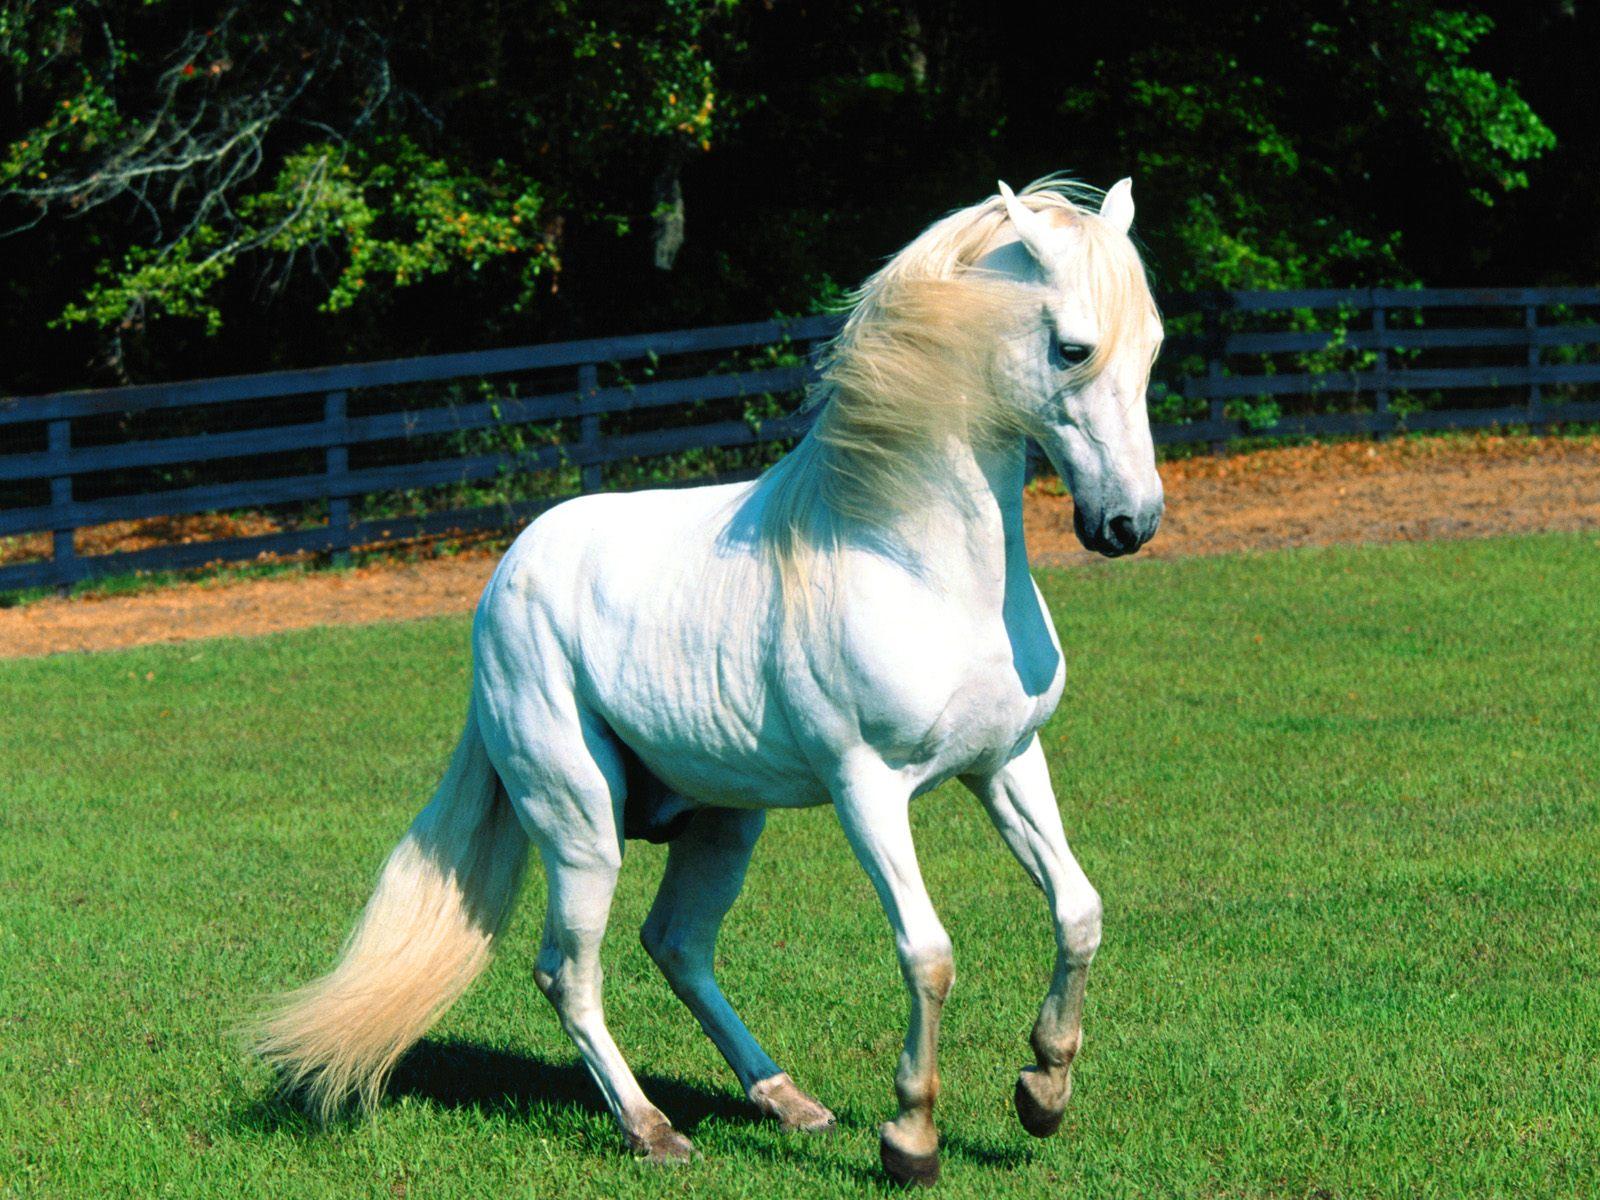 Beautiful Wallpaper Horse Laptop - the-best-top-desktop-horse-wallpapers-3  Graphic_13834.jpg